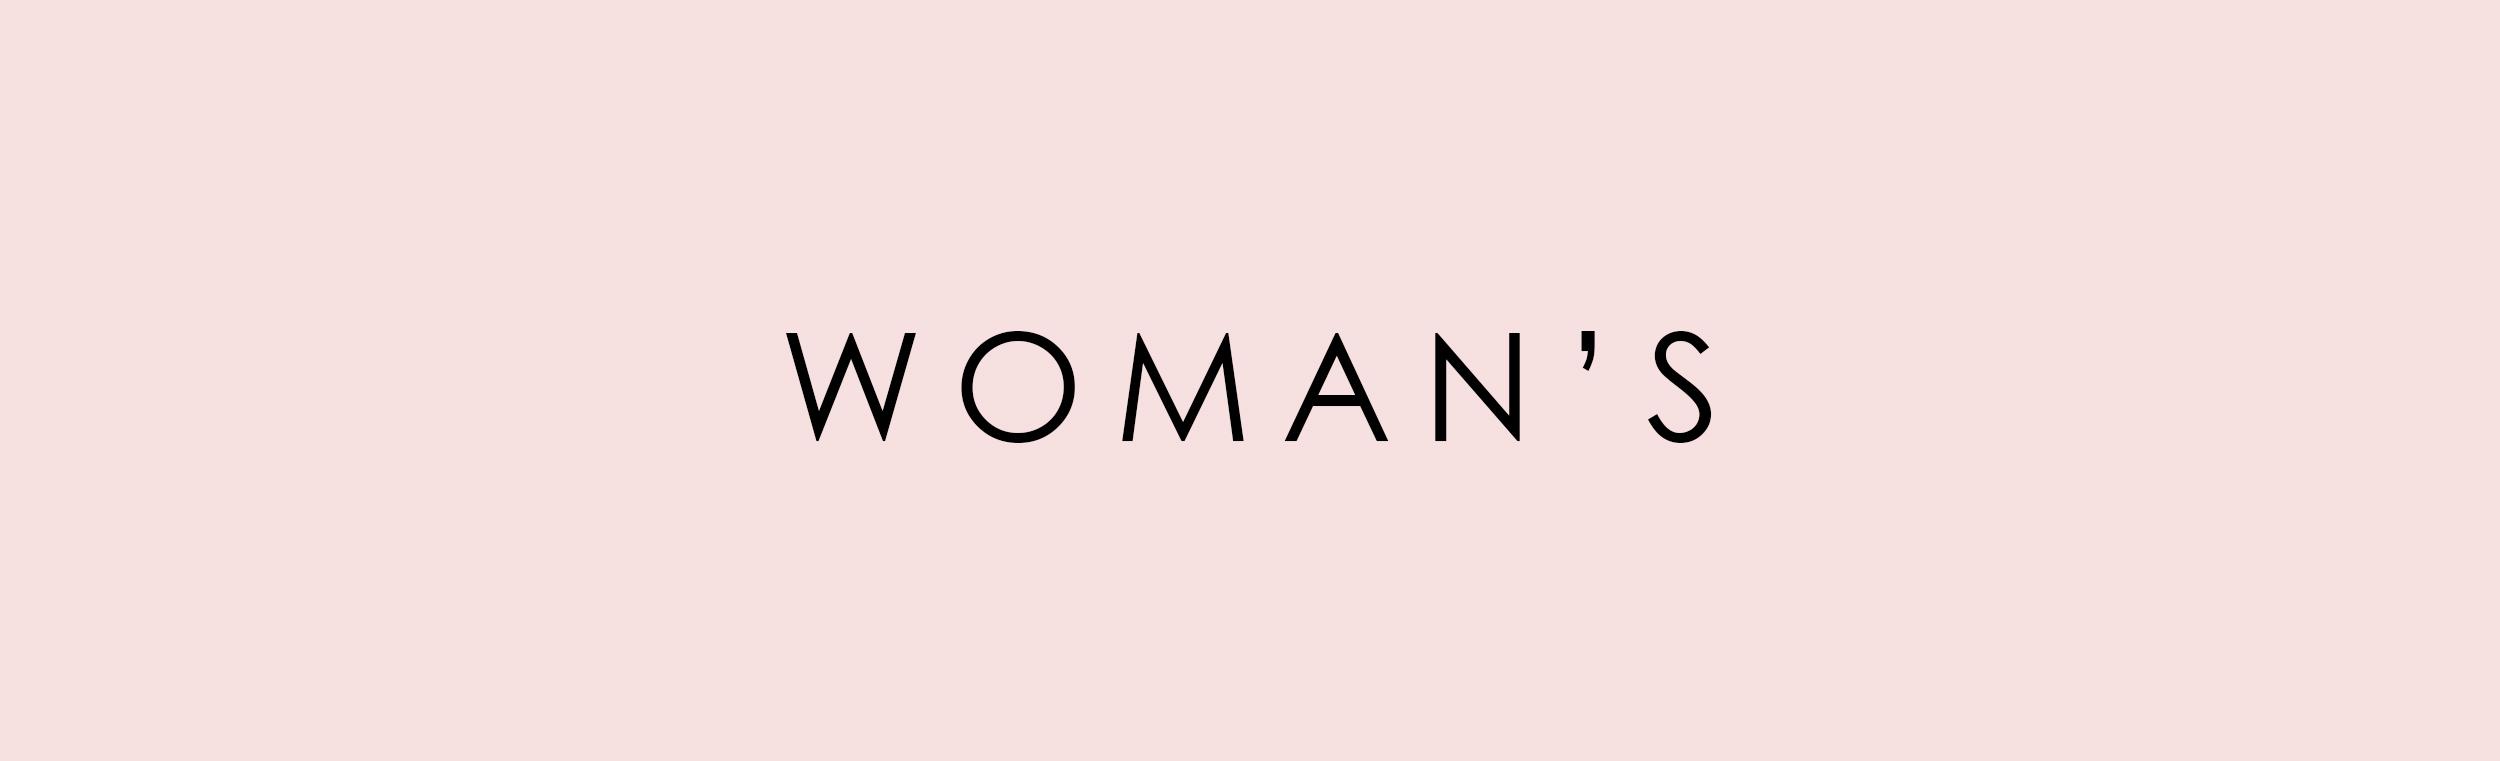 Woman's Button.jpg